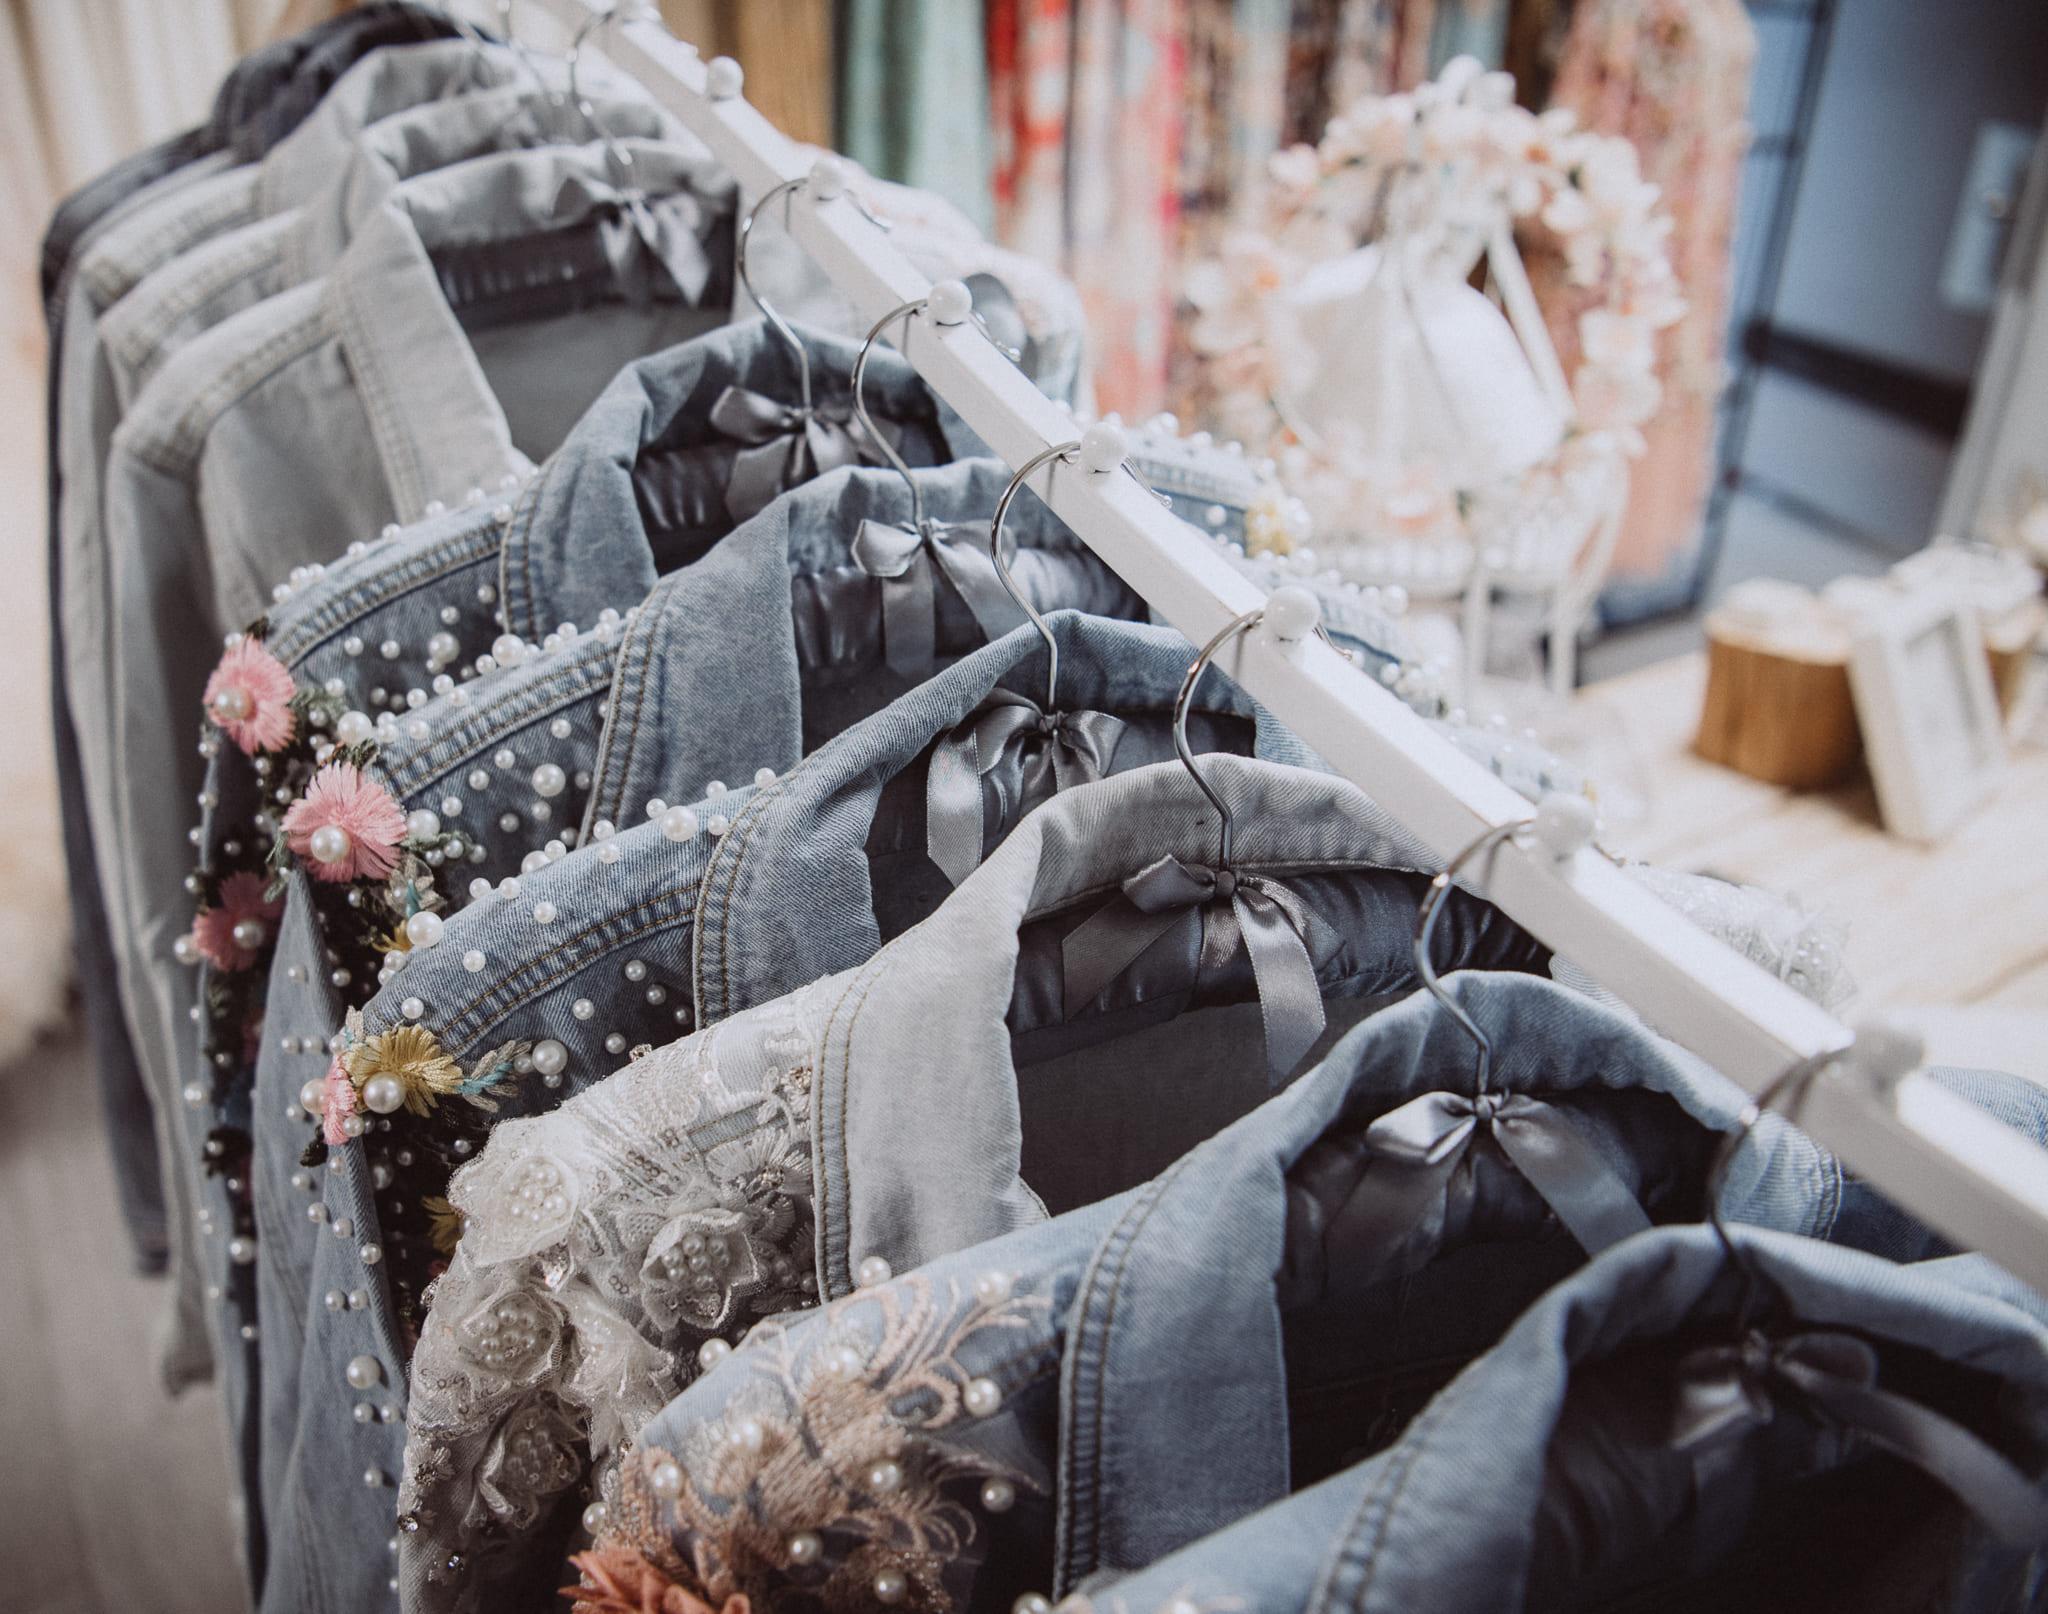 boho-bride-boutique-brautmodengeschaeft-gommiswald-accessoires-jeansjacke